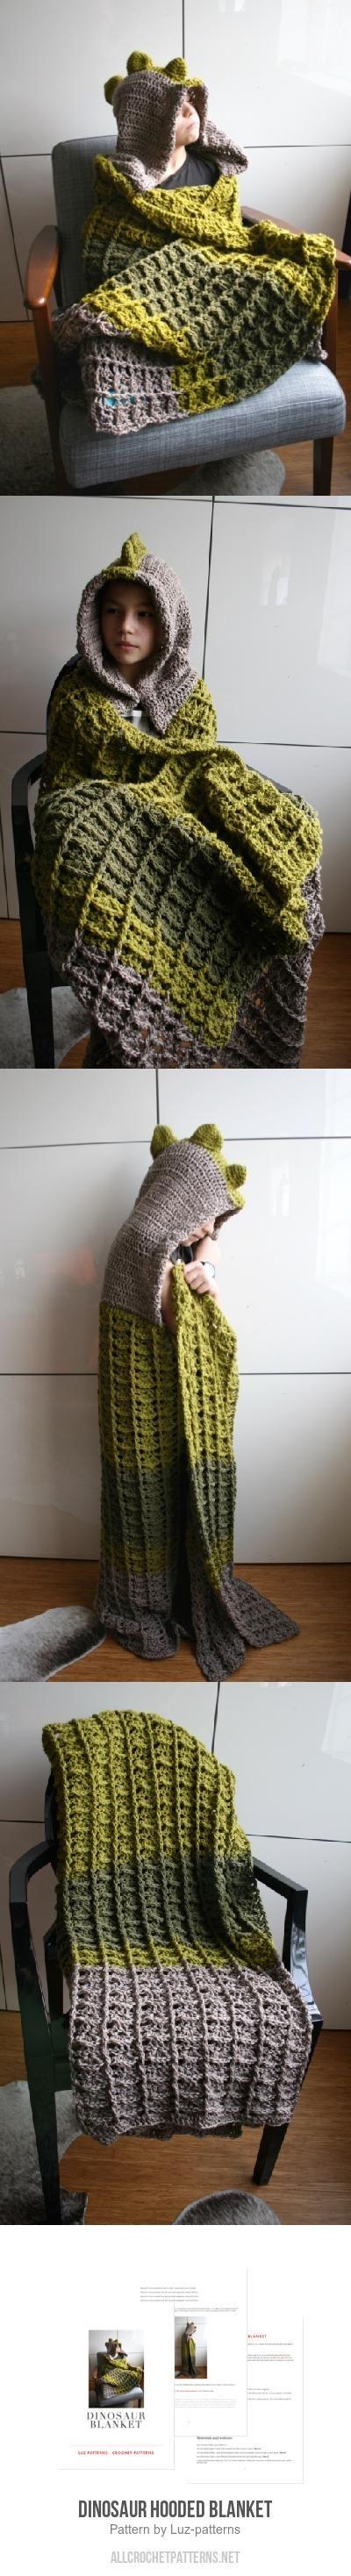 Dinosaur Hooded Blanket Crochet Pattern By Luz Patterns Crafts